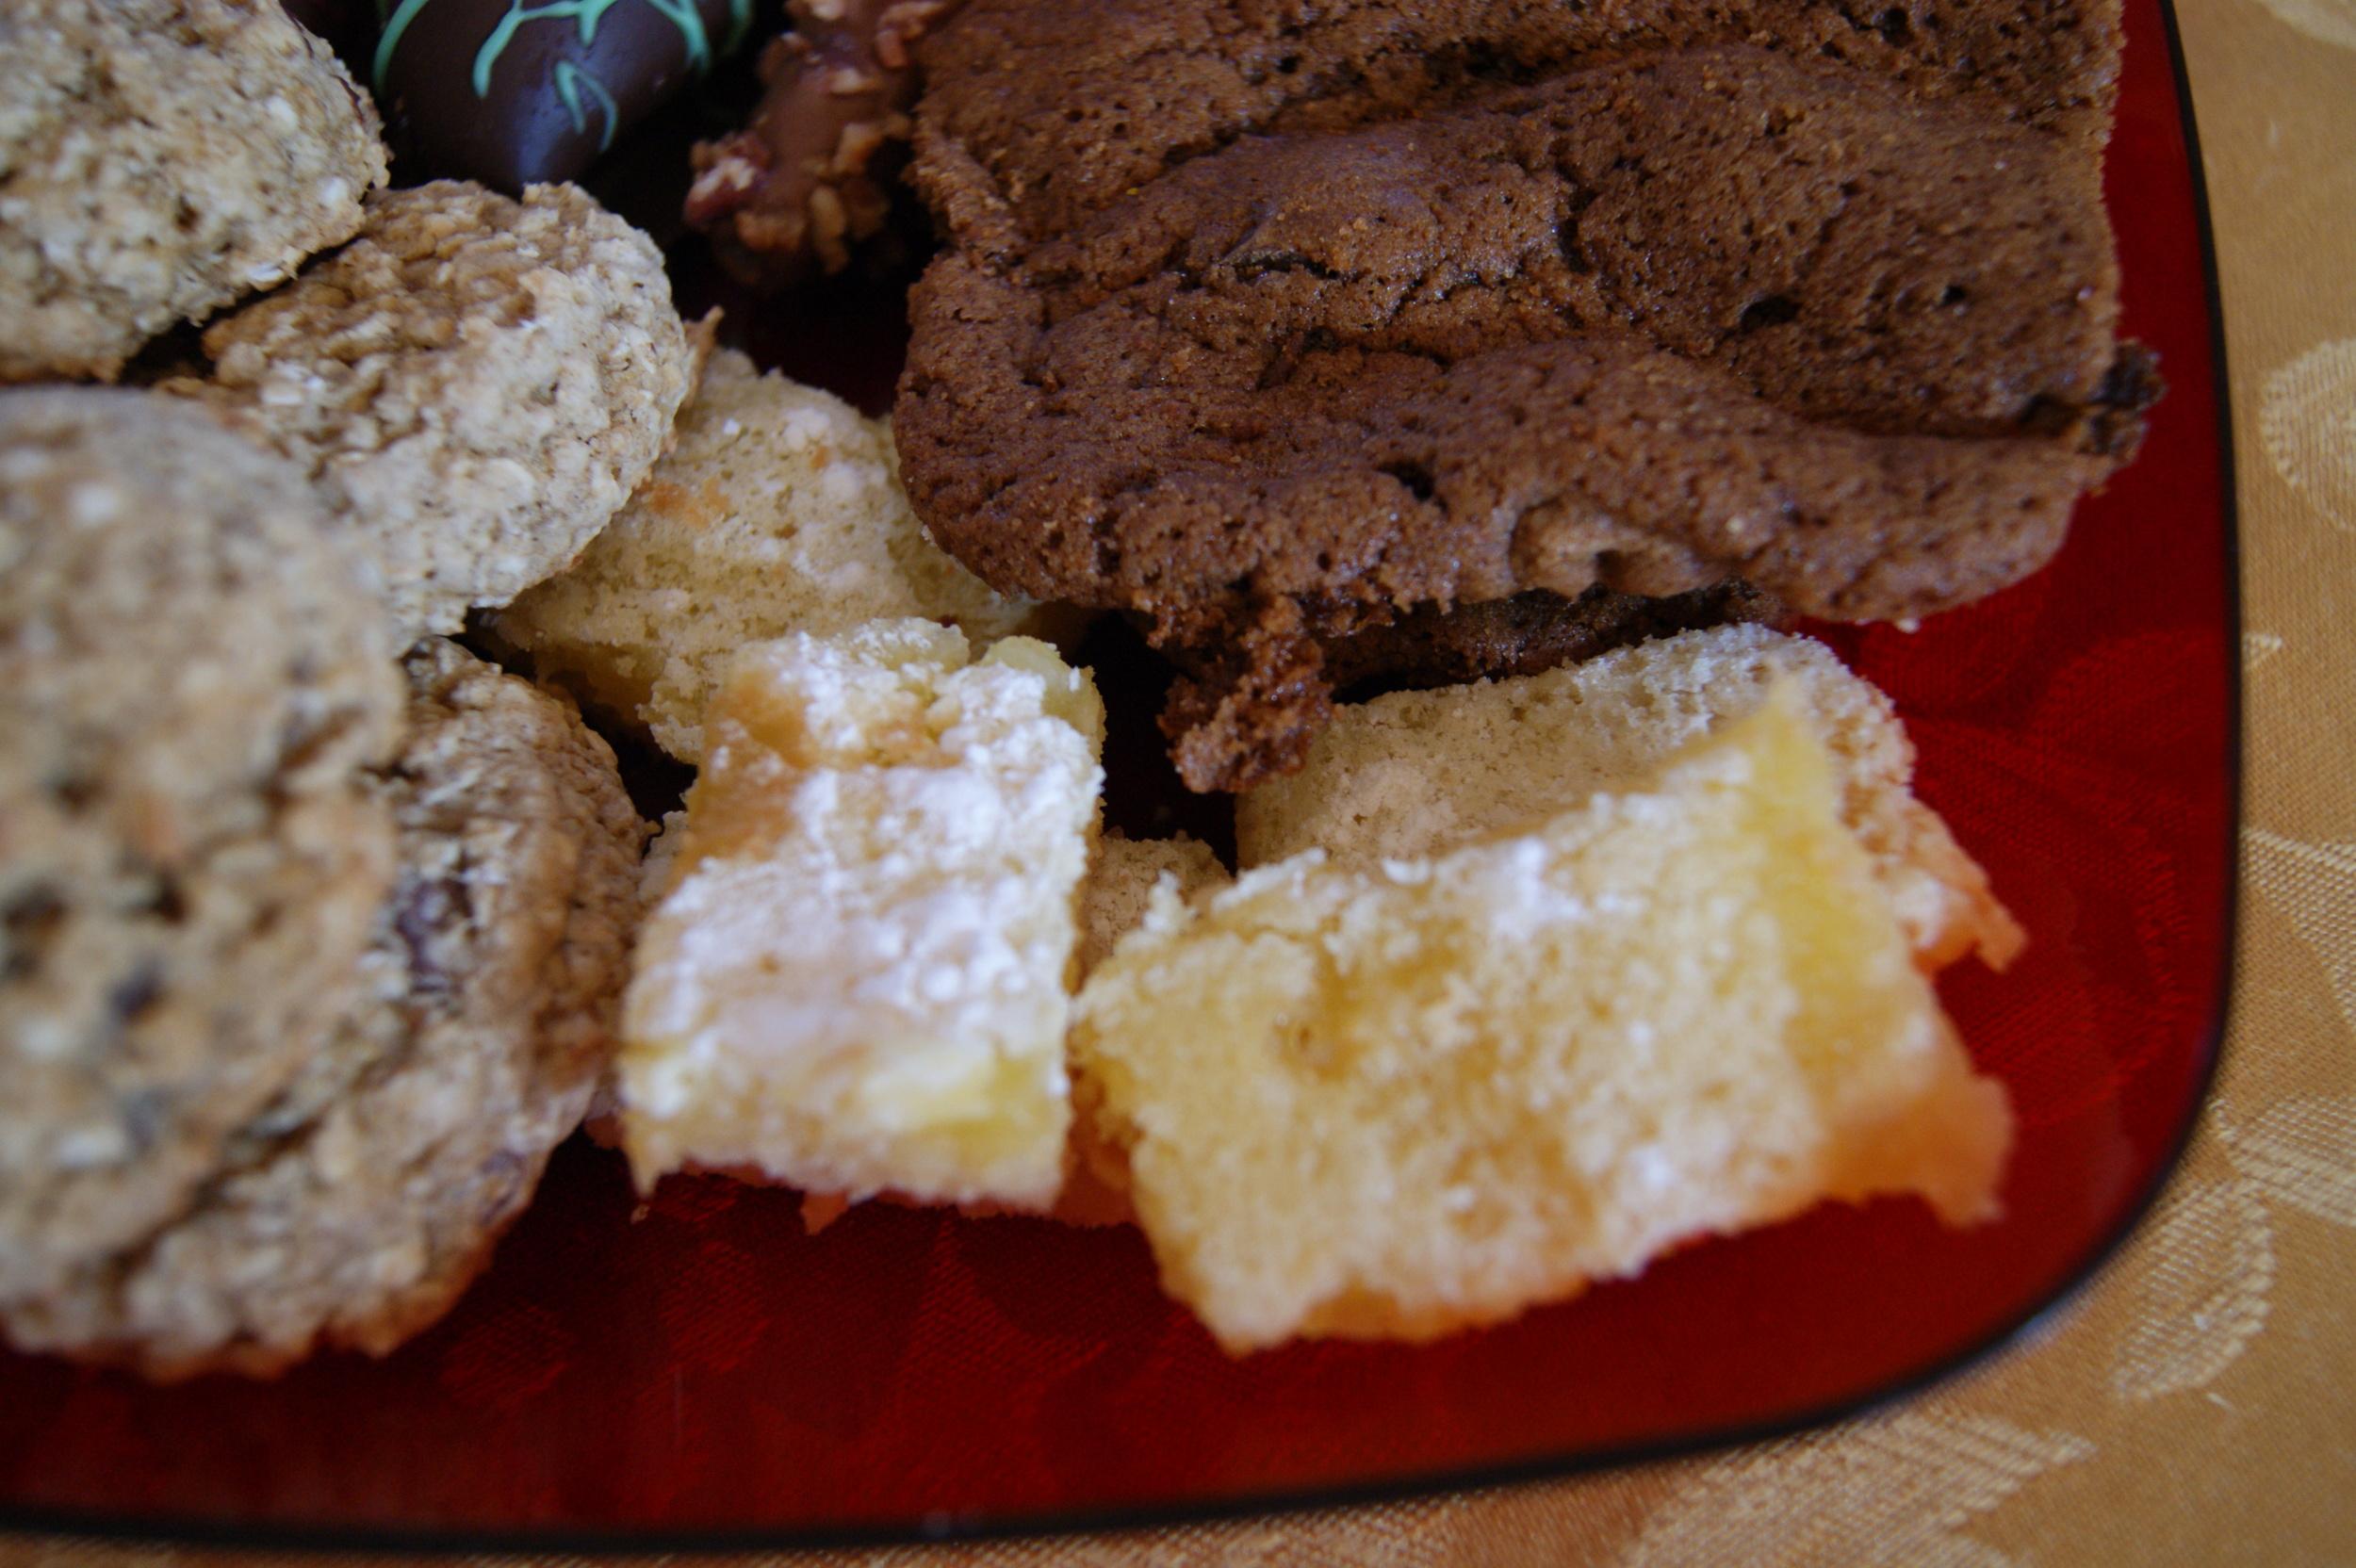 Glenn's lemon bars & my heart healthy oatmeal chocolate chip cookies